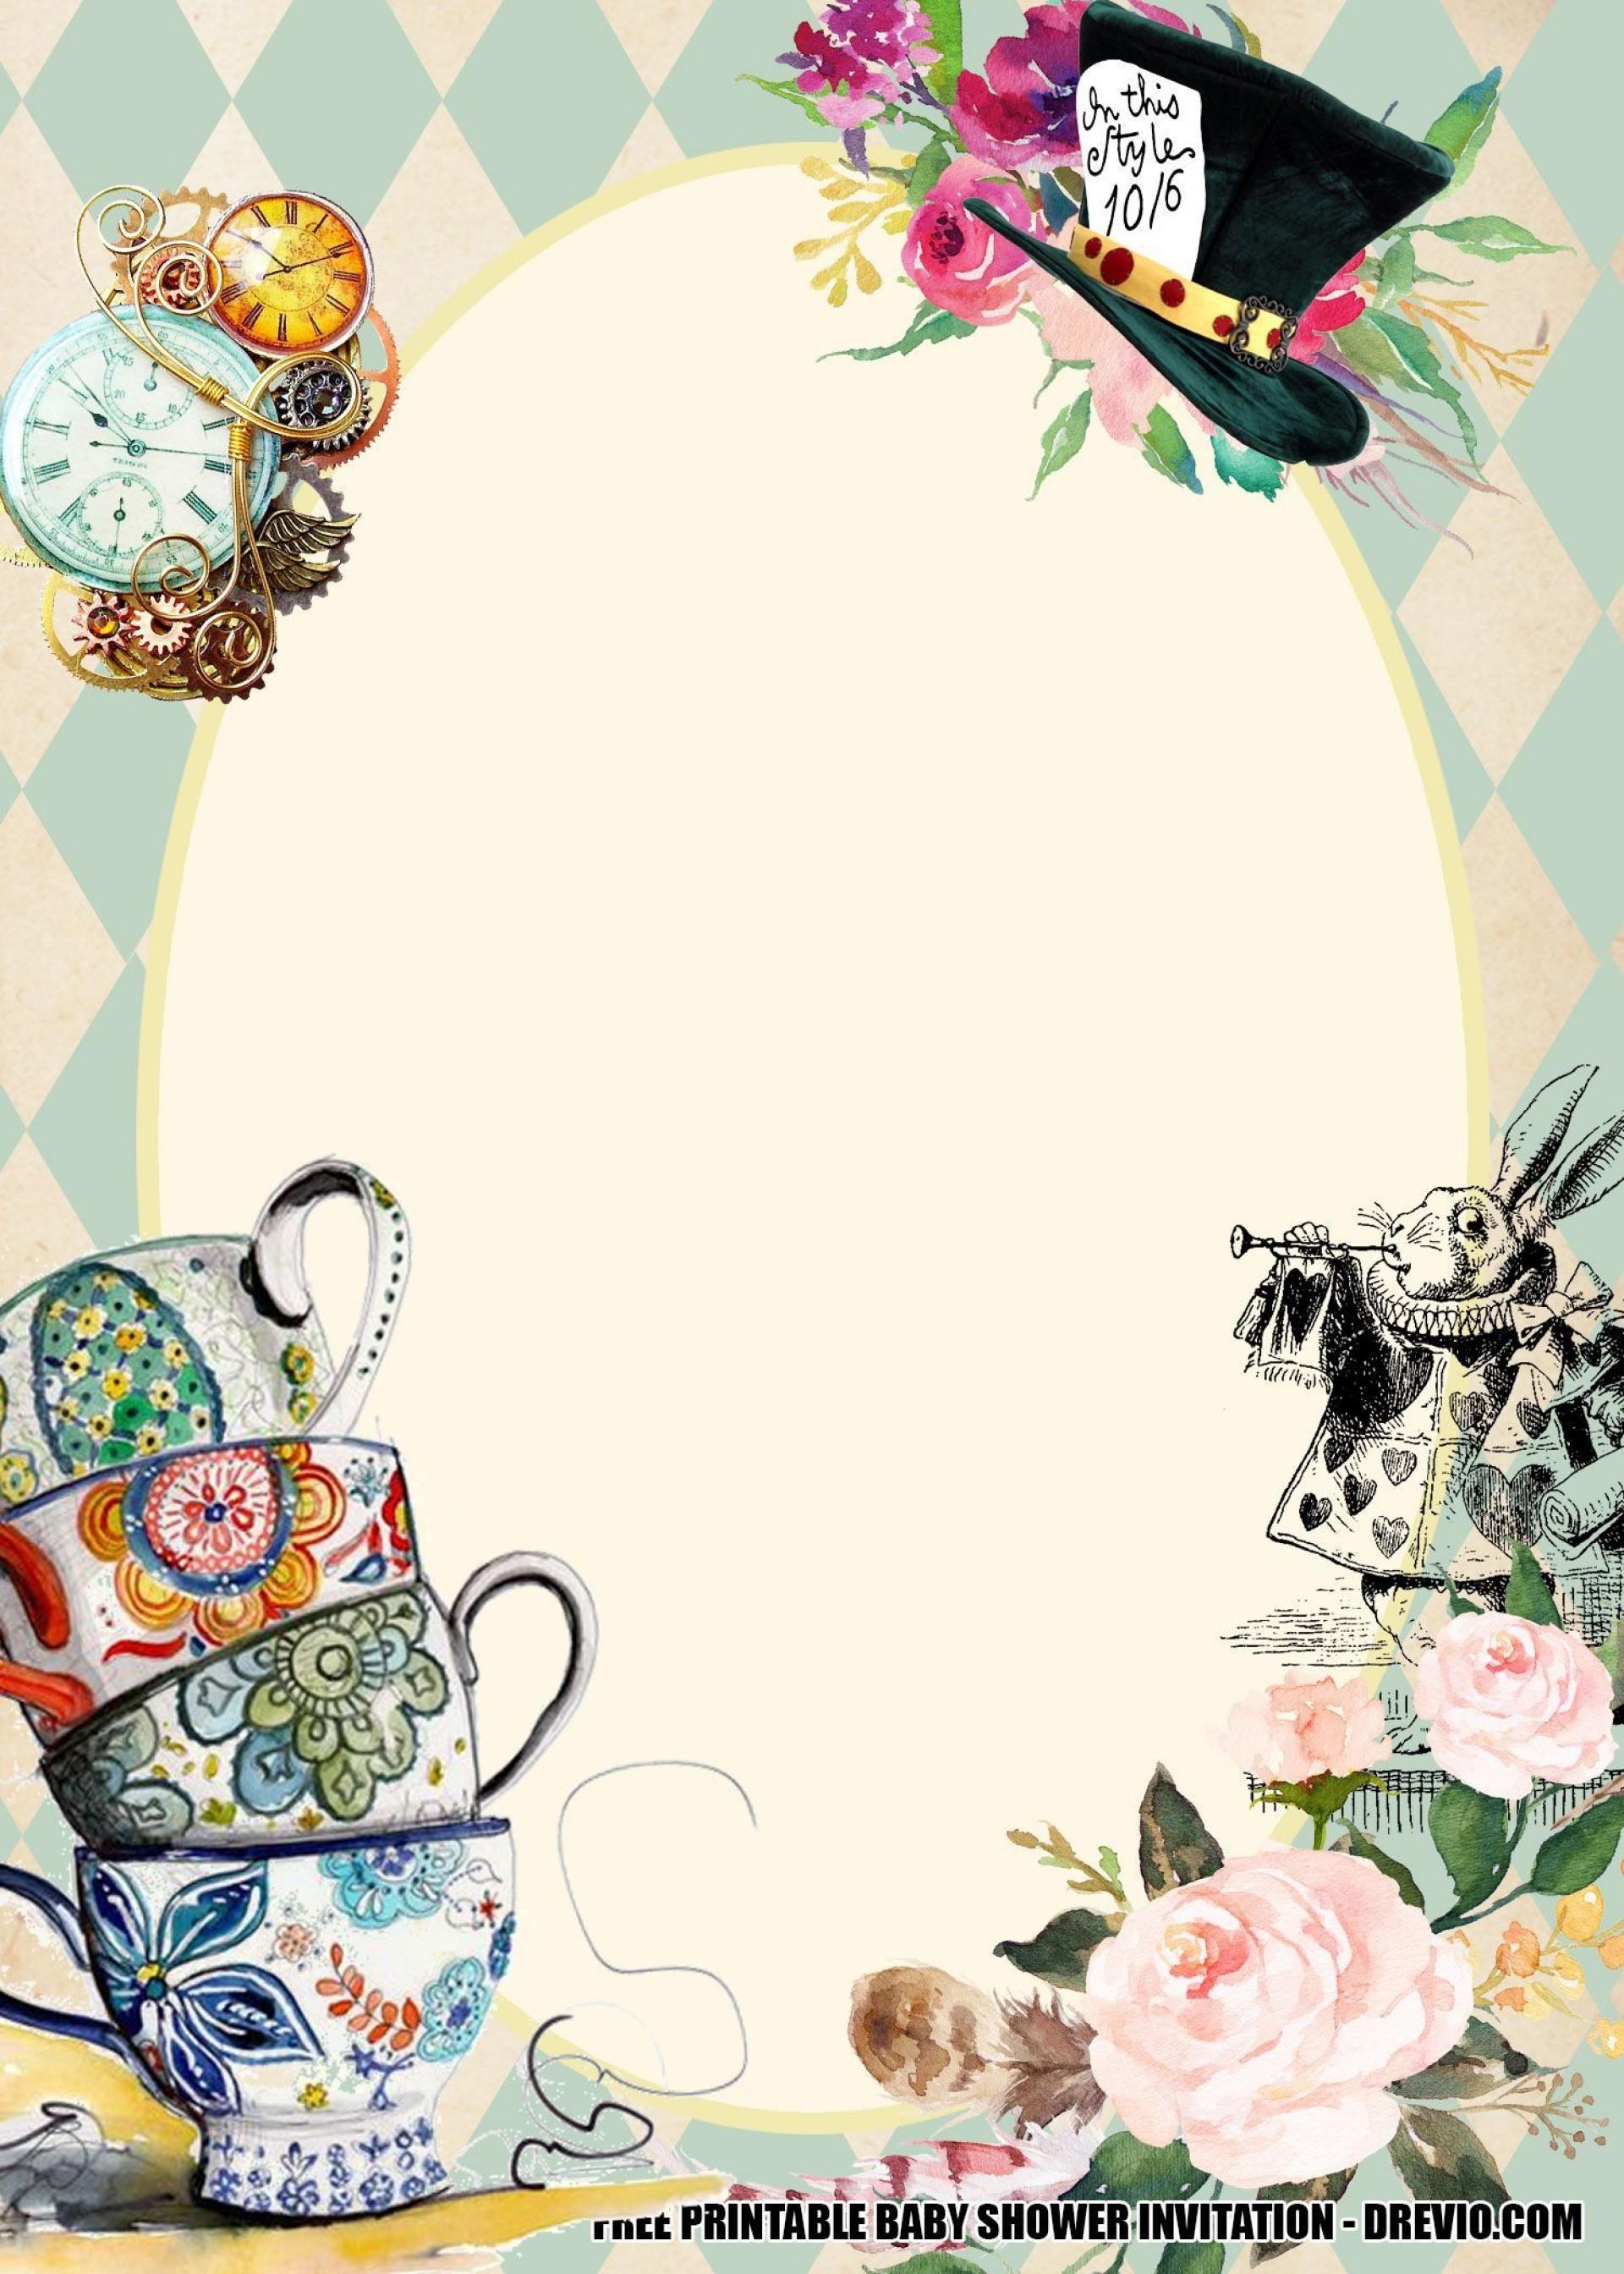 000 Stunning Alice In Wonderland Invitation Template Download Design  Free1920